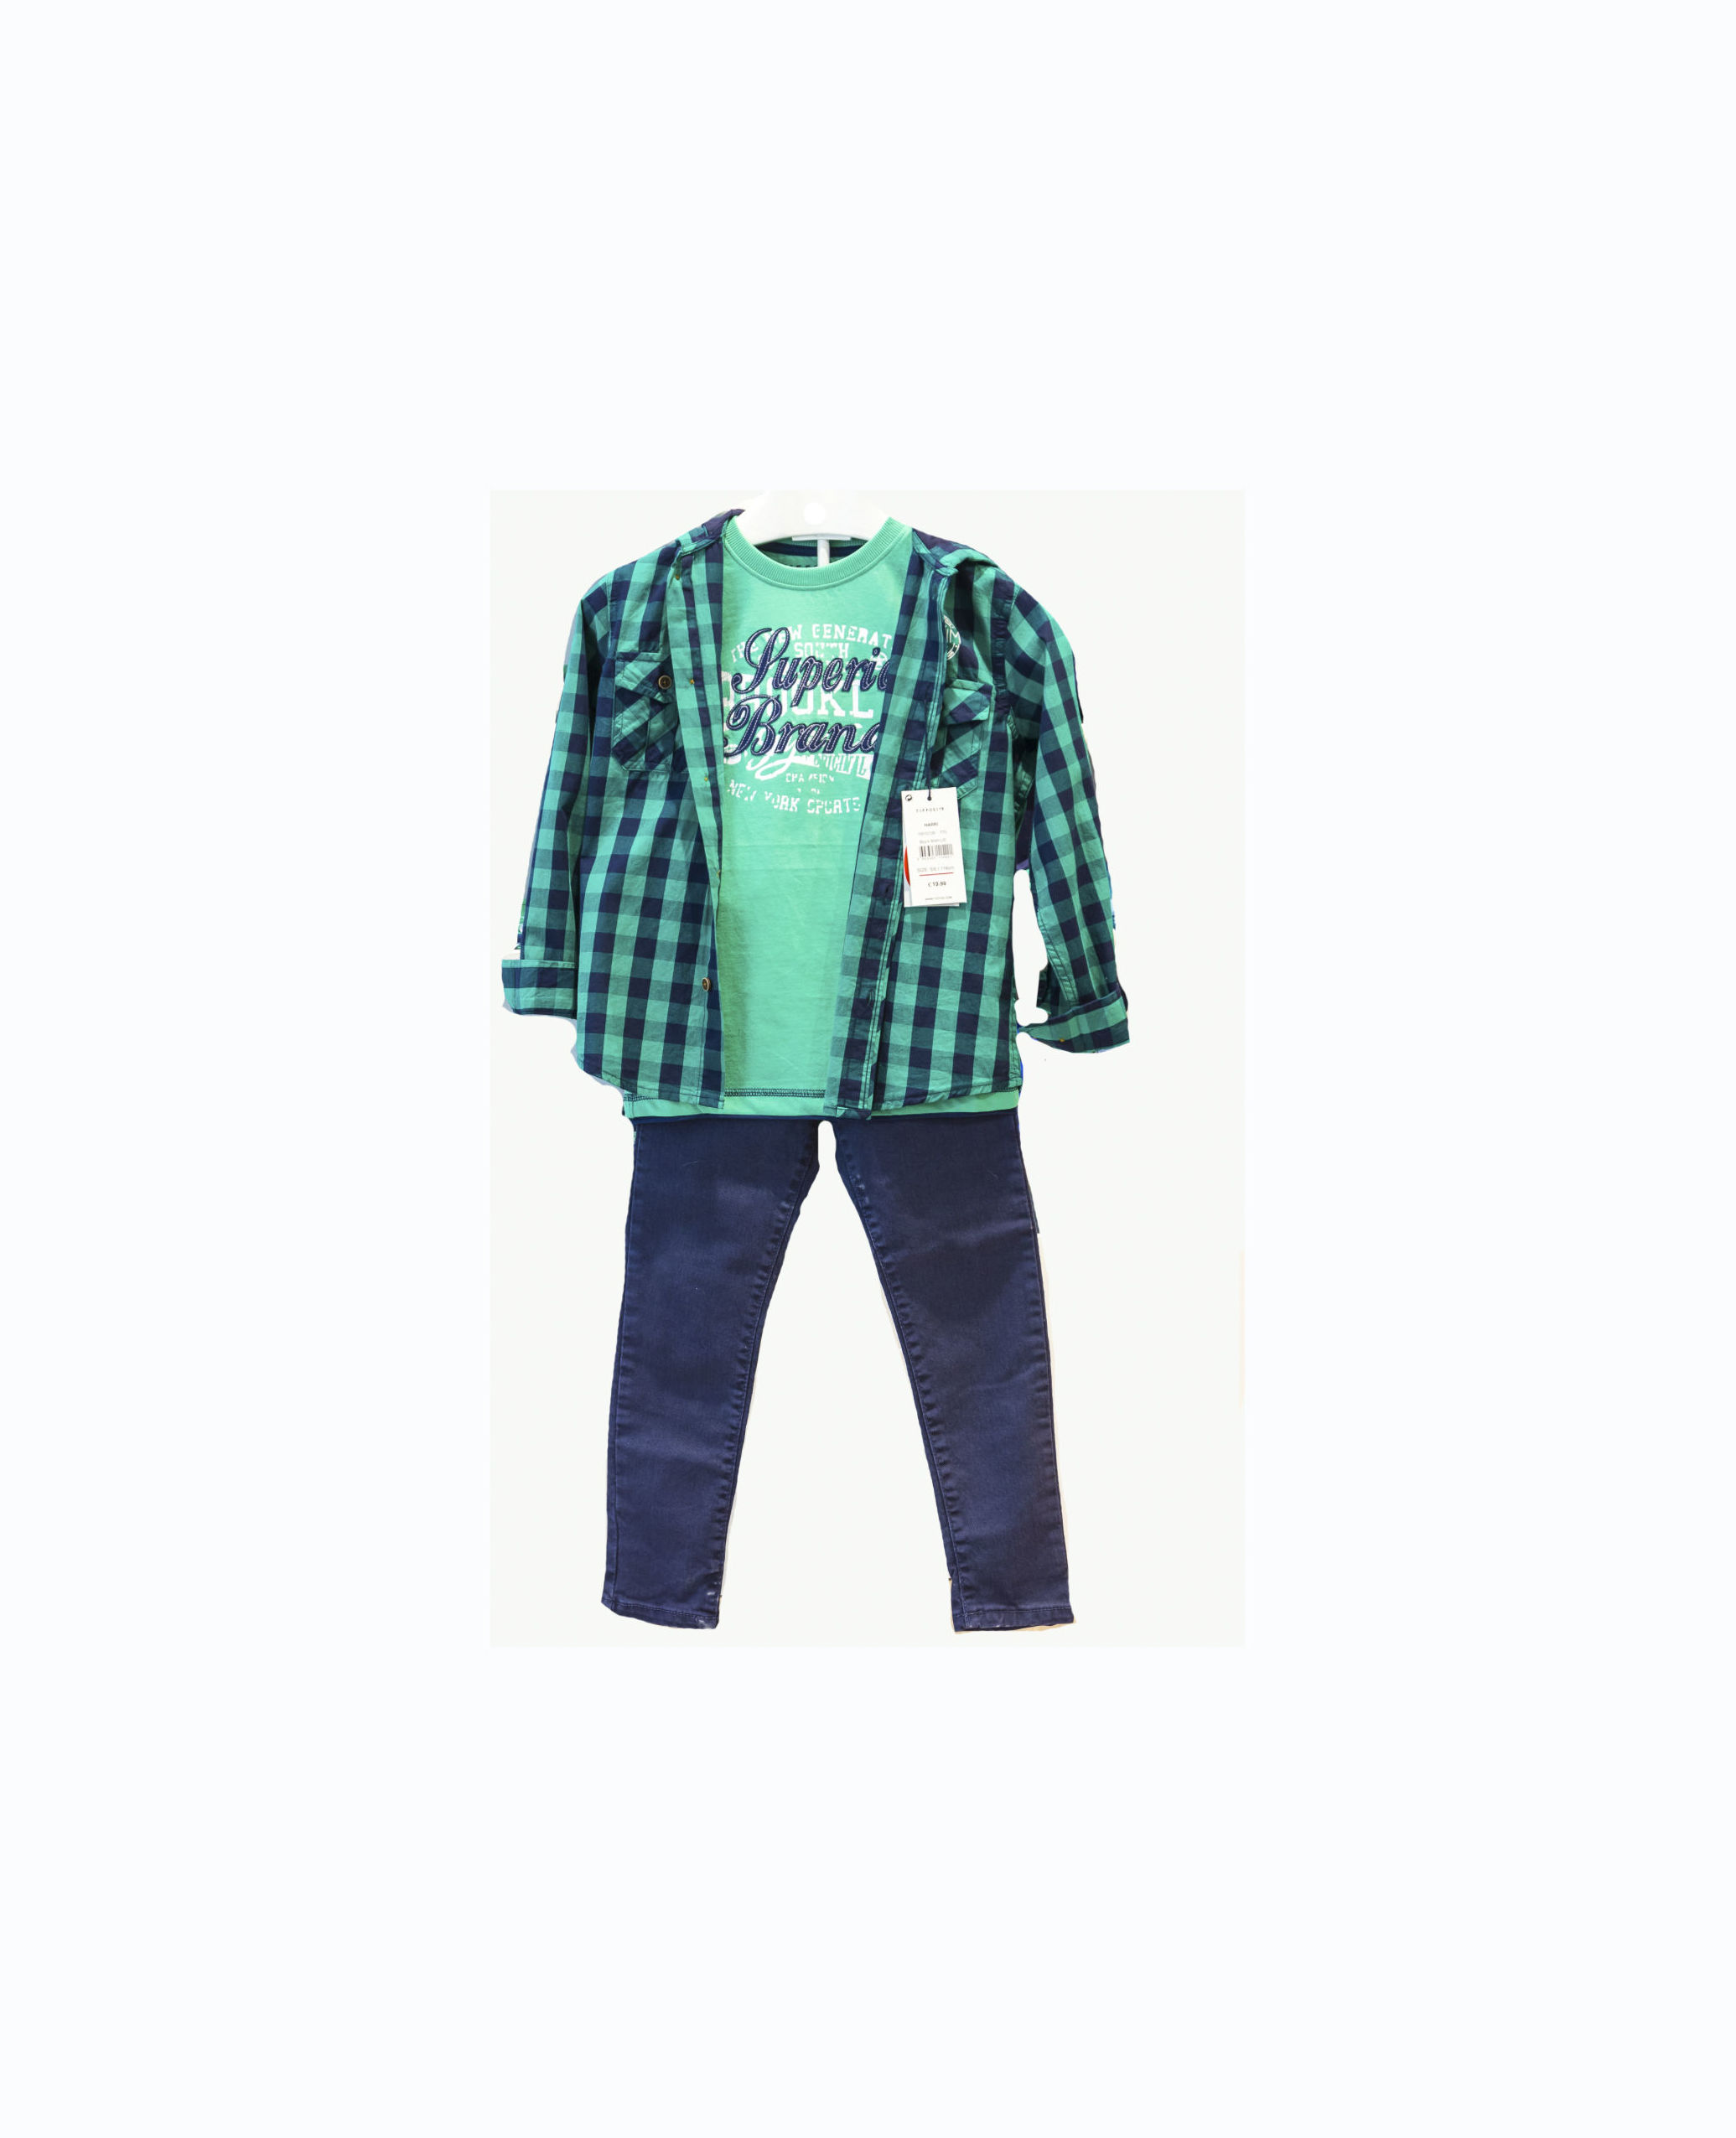 Foto 47 de Completo catálogo de moda infantil de 0 a 14 años en València   Nio Moda Infantil